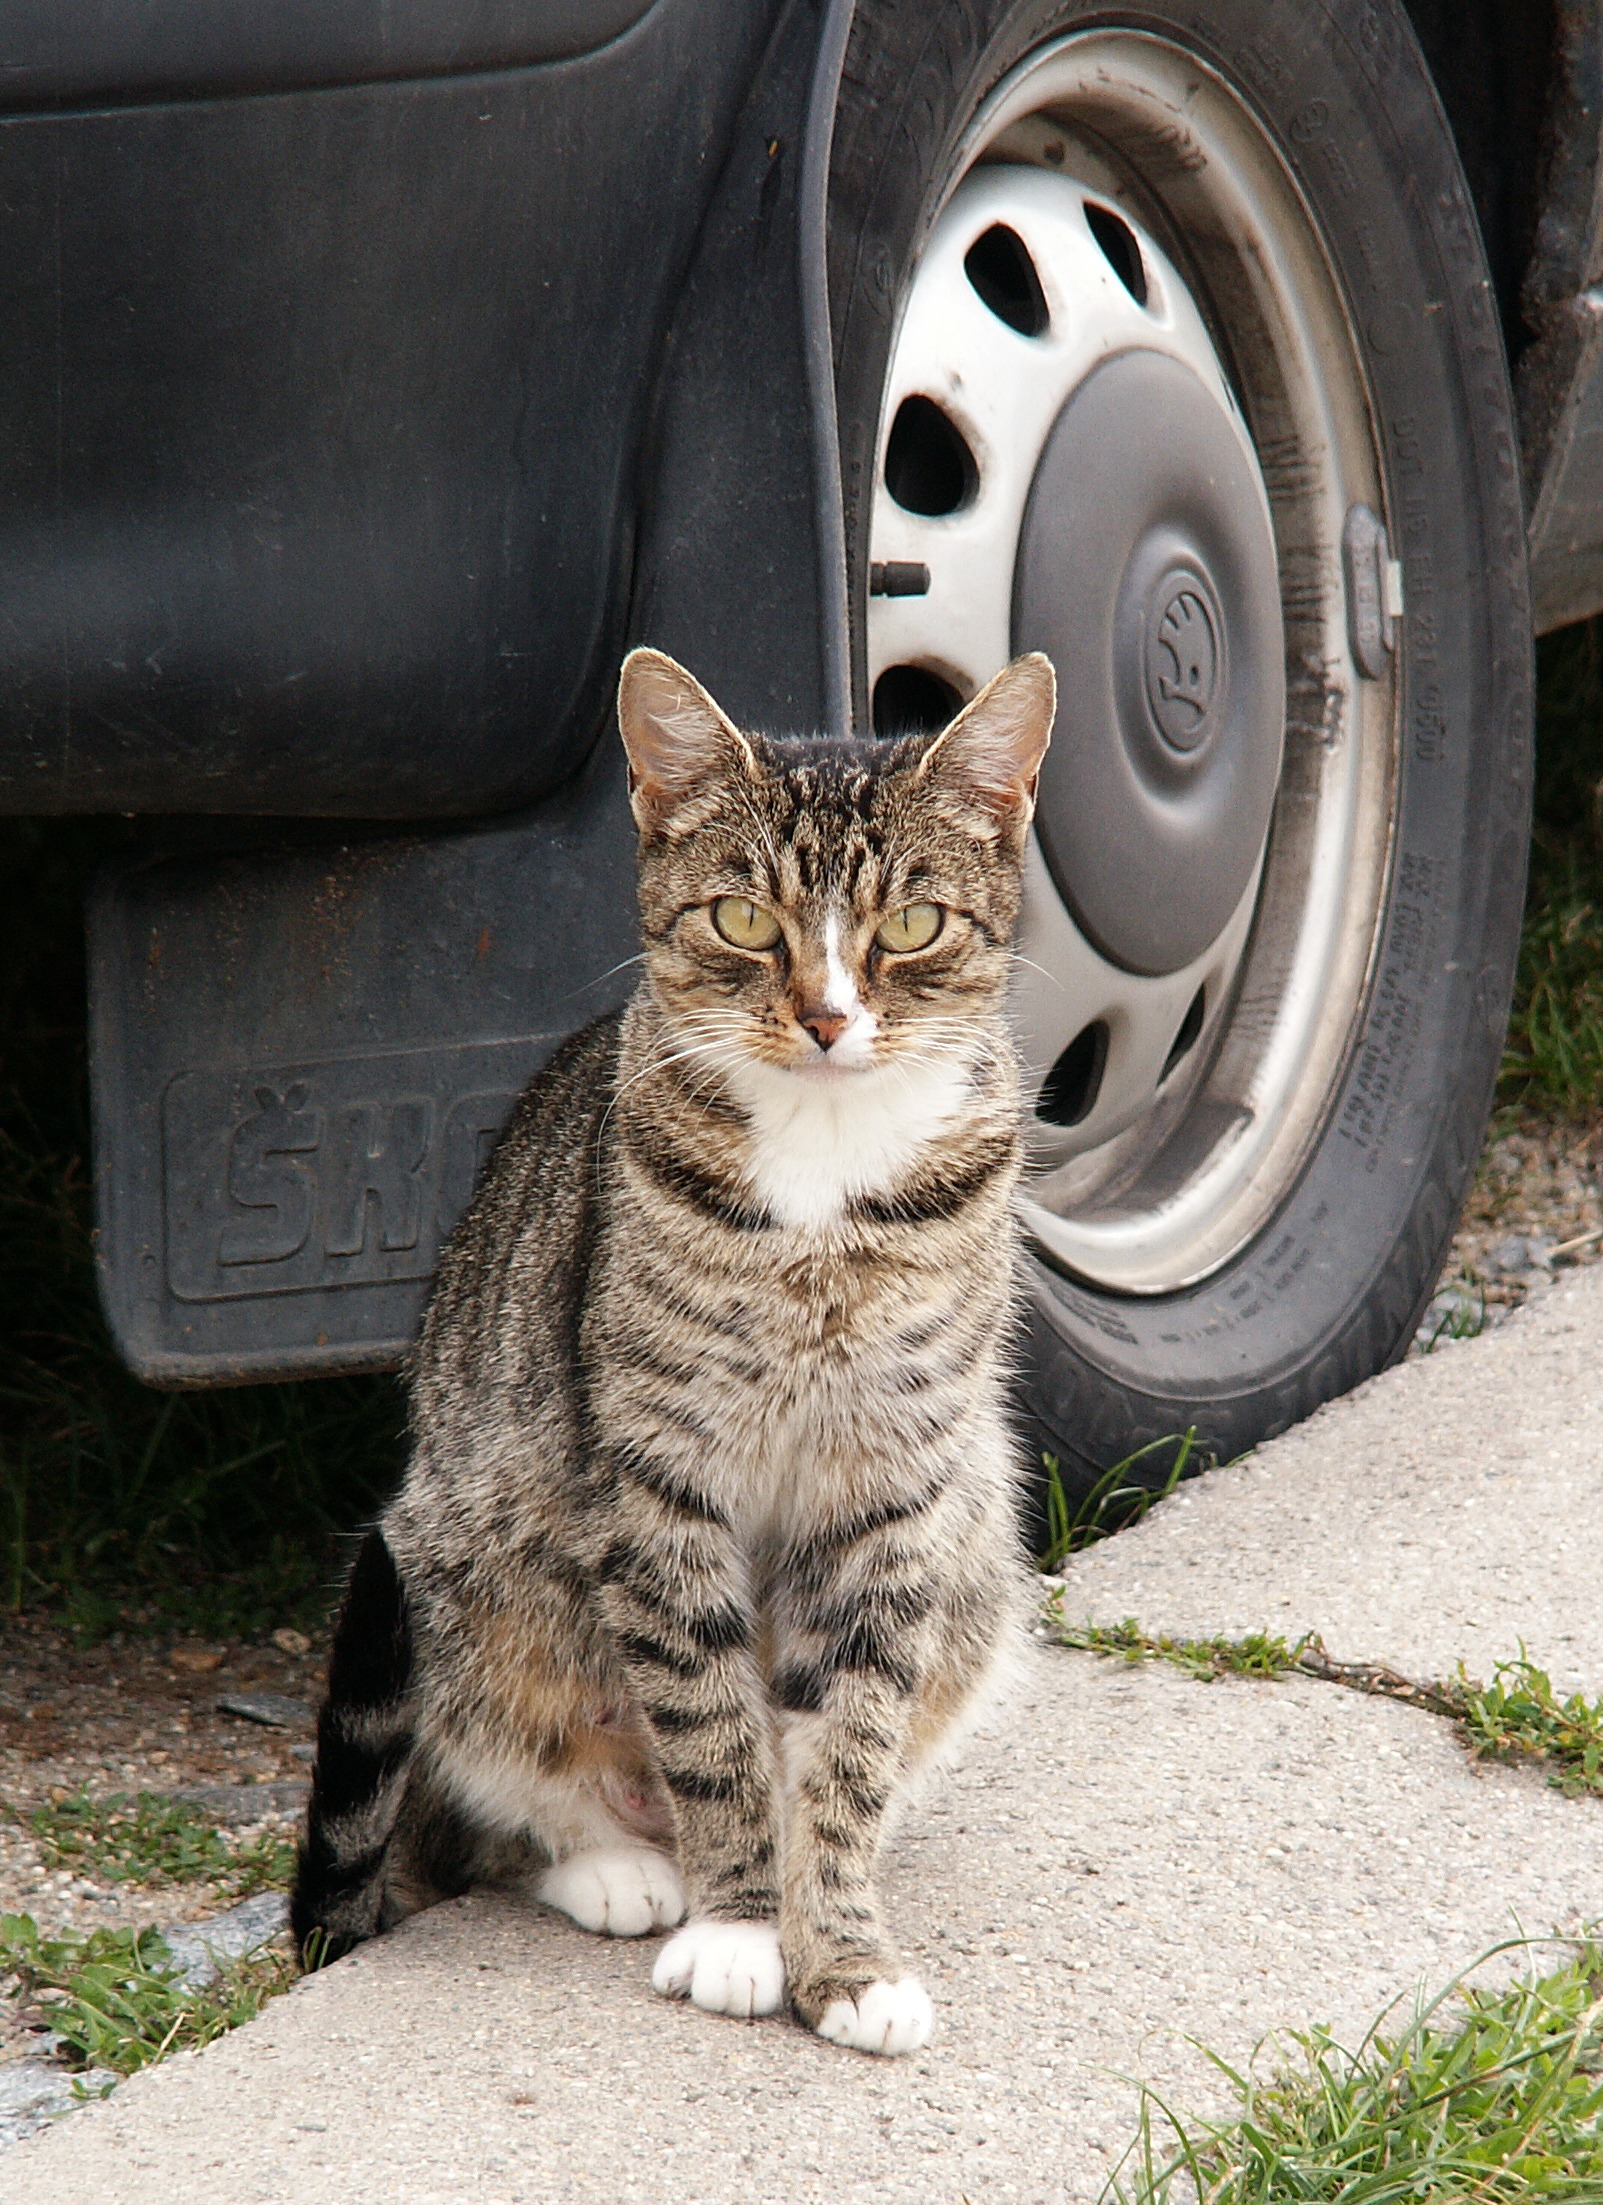 Cat_and_Car_2_Sam_Rawlins